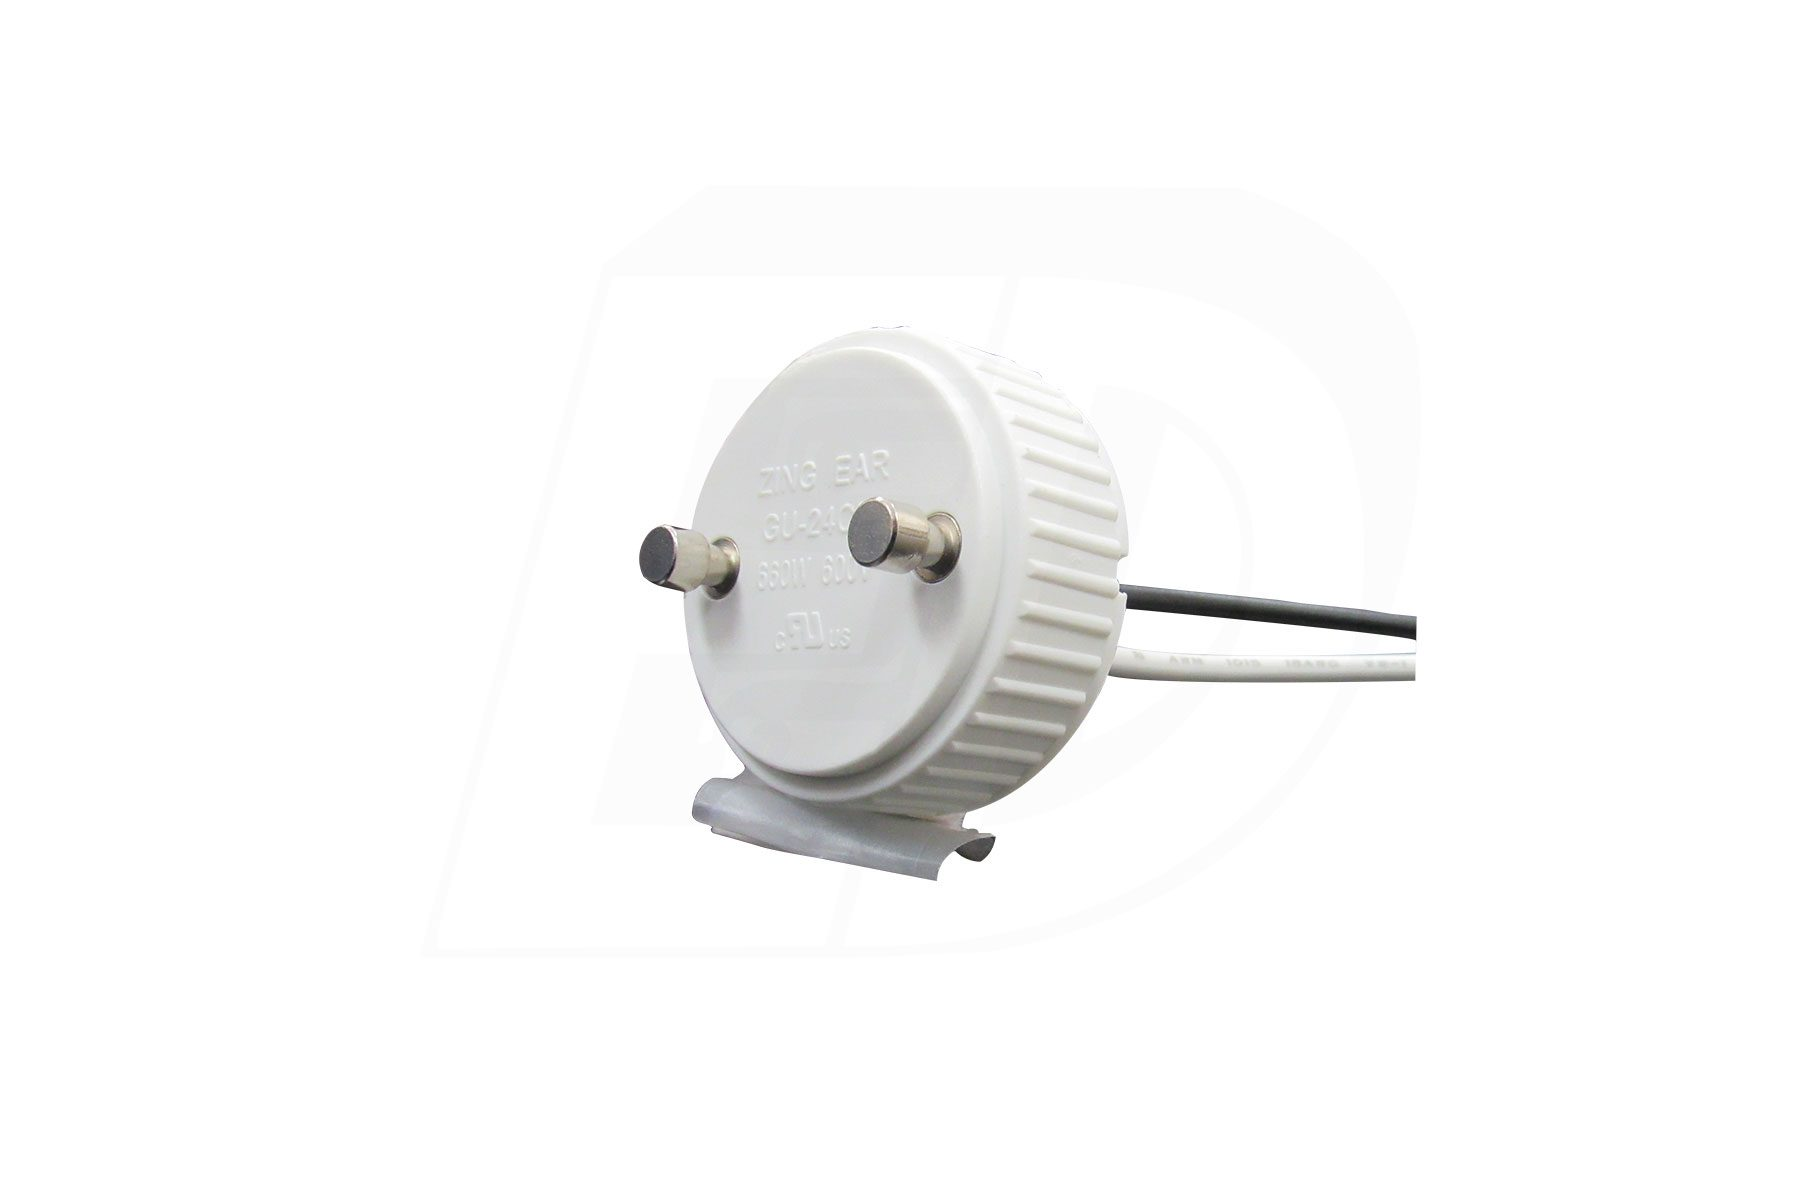 GU24 Base Light Bulb Socket Adapter